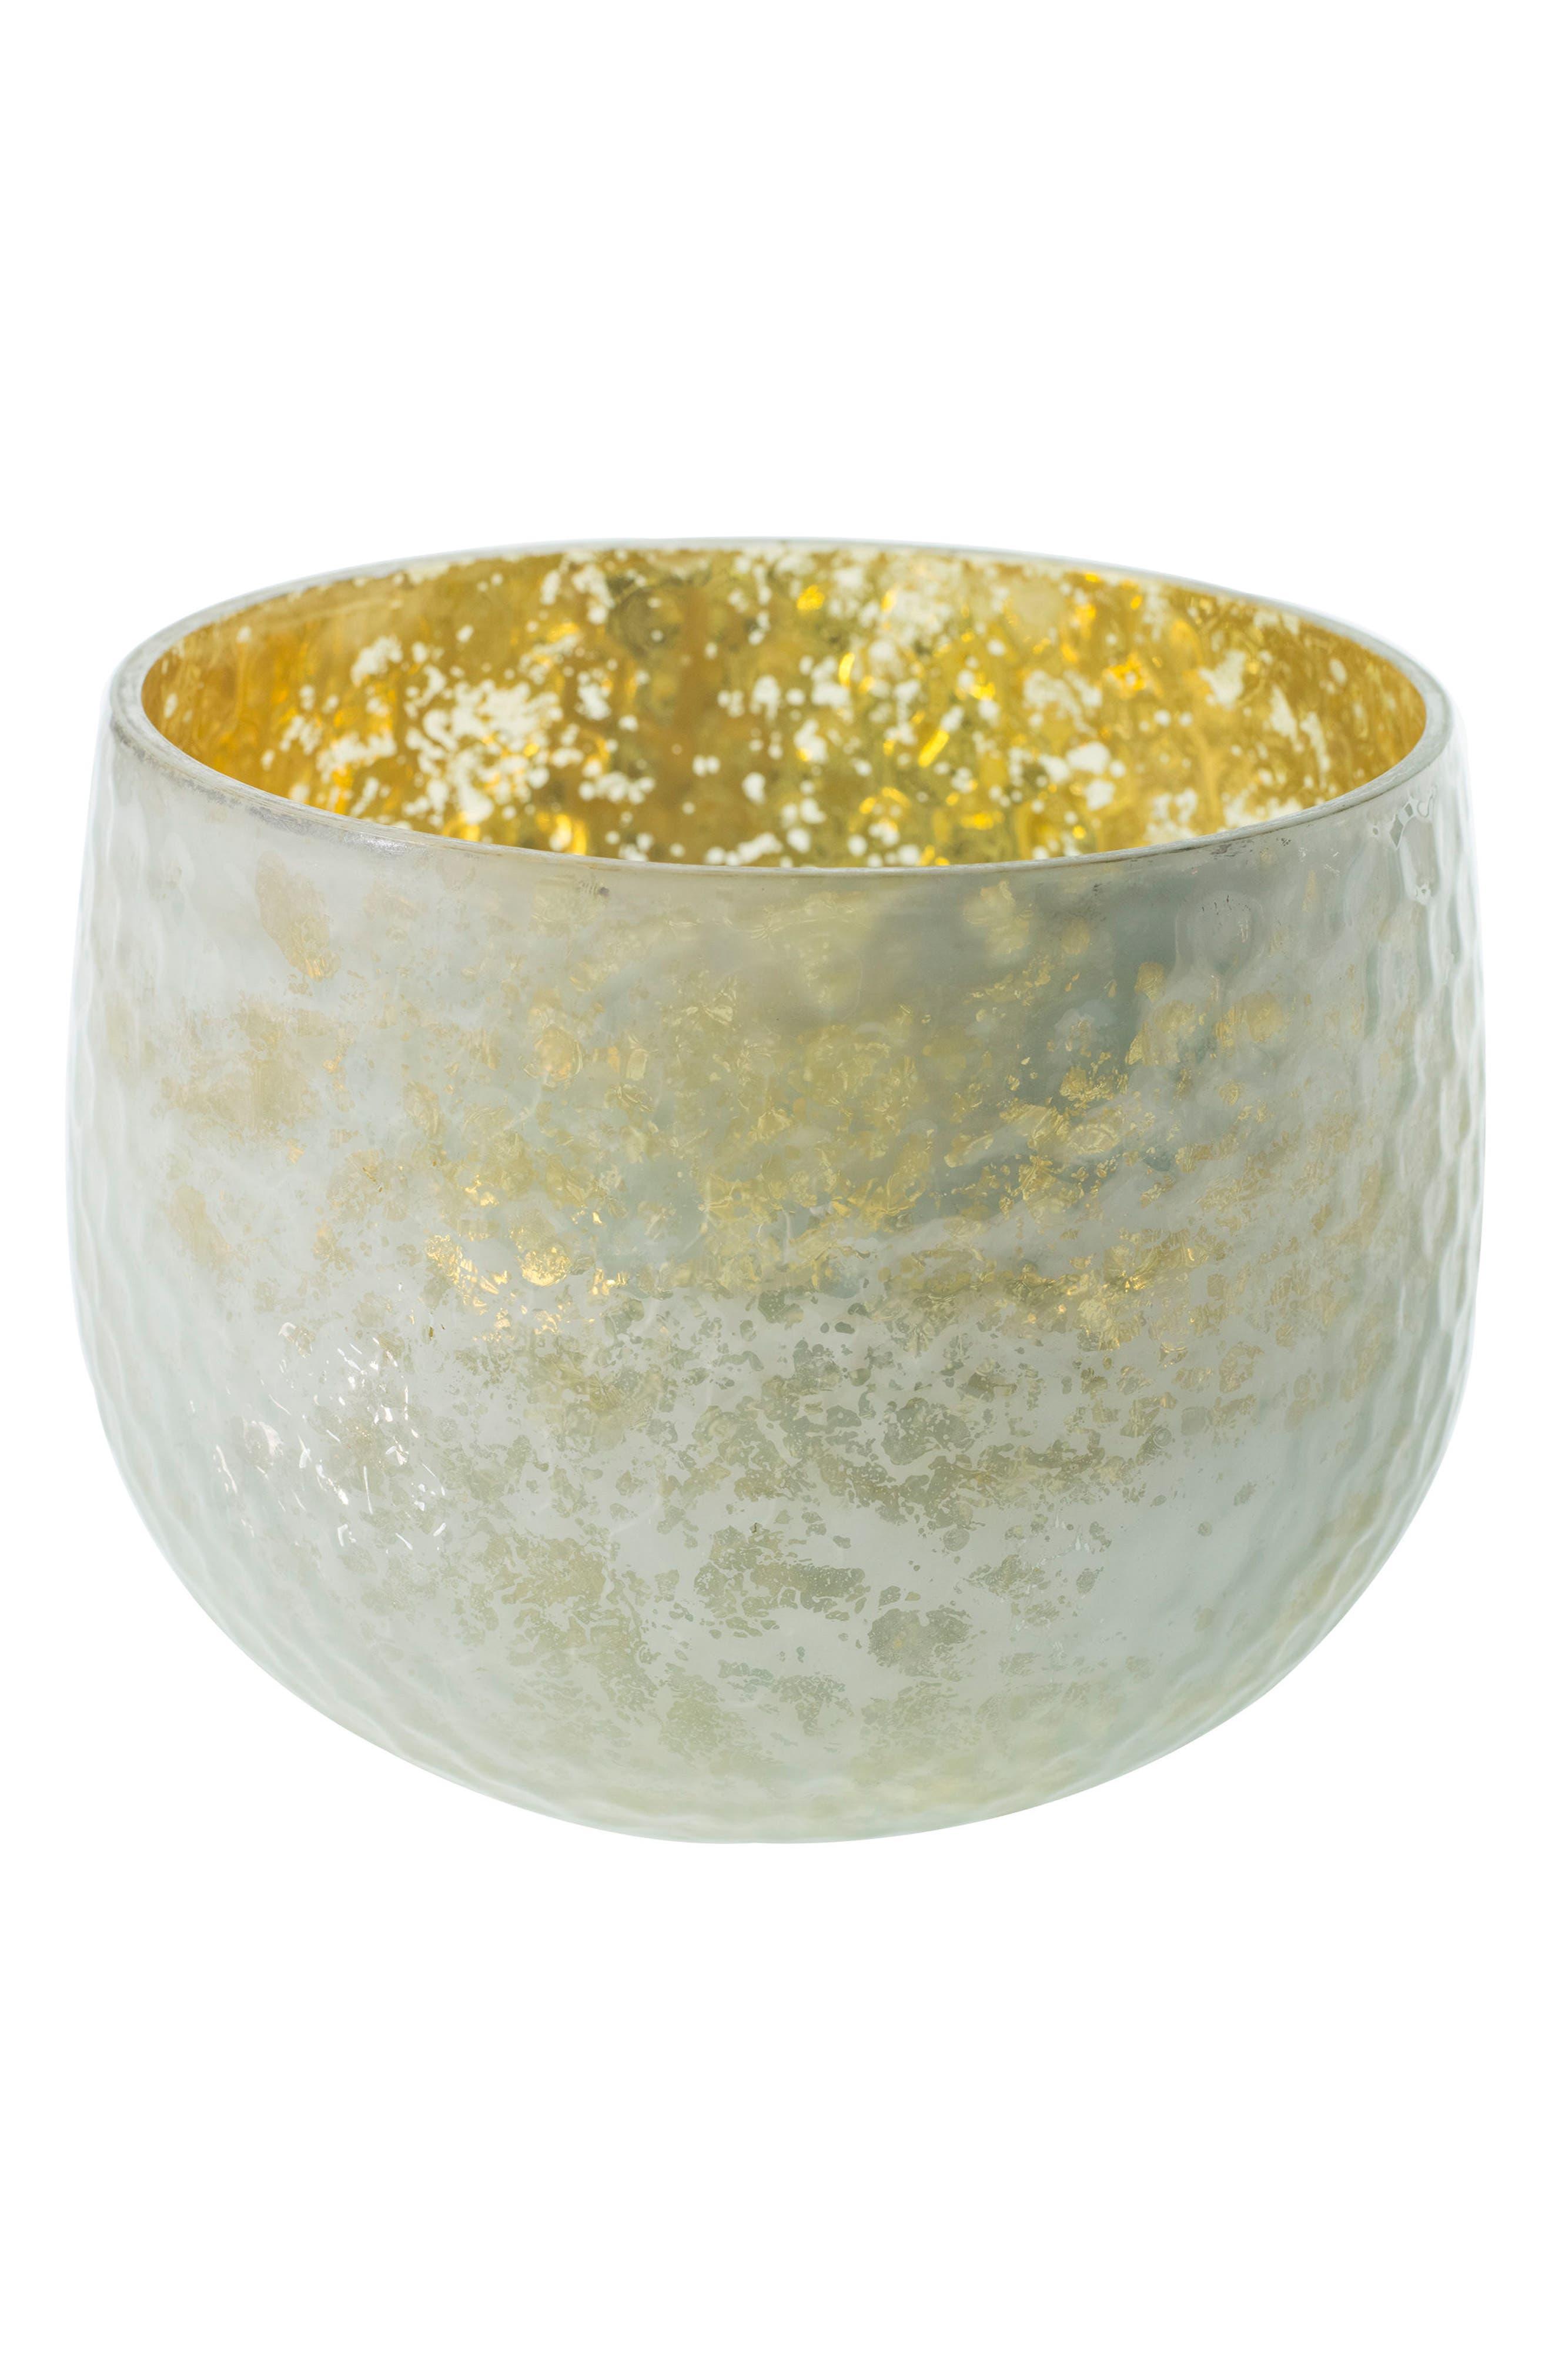 Alternate Image 1 Selected - Accent Decor Radiant Mercury Glass Vase